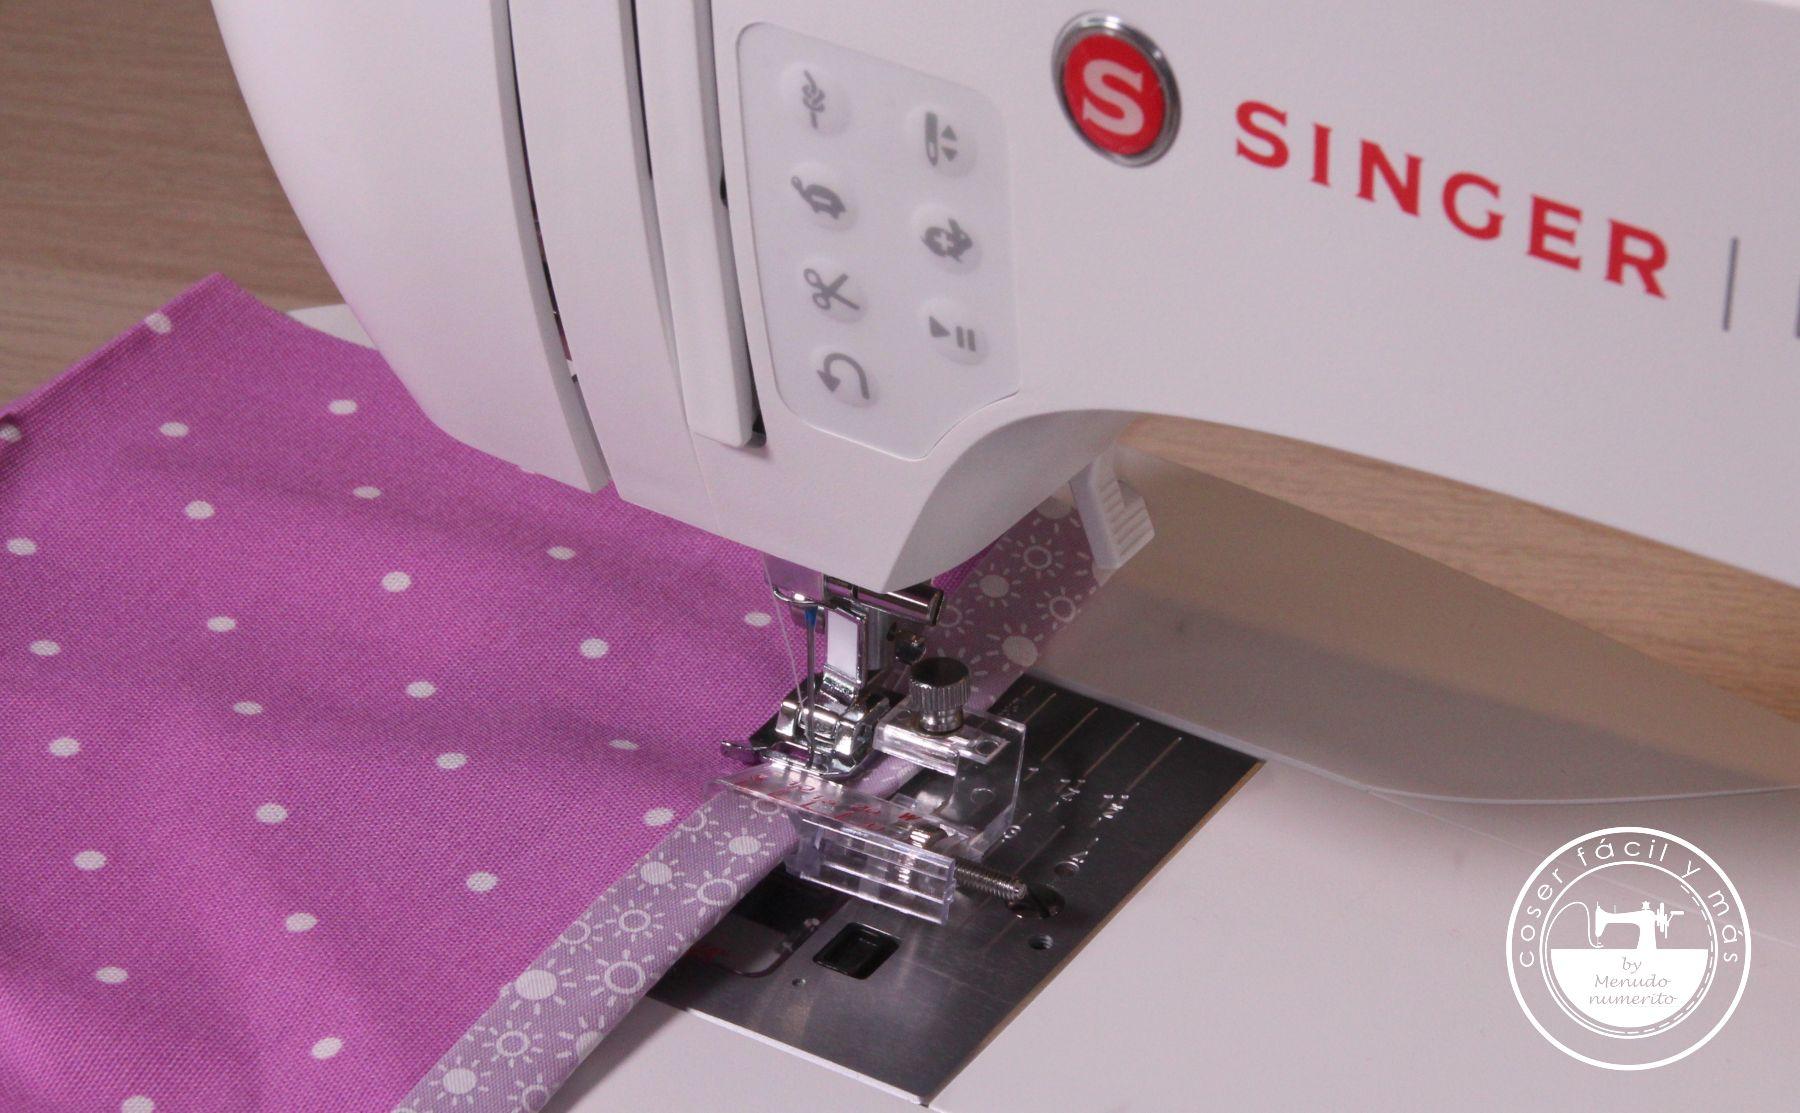 prensatelas para bies en squina coser facil blogs de costura